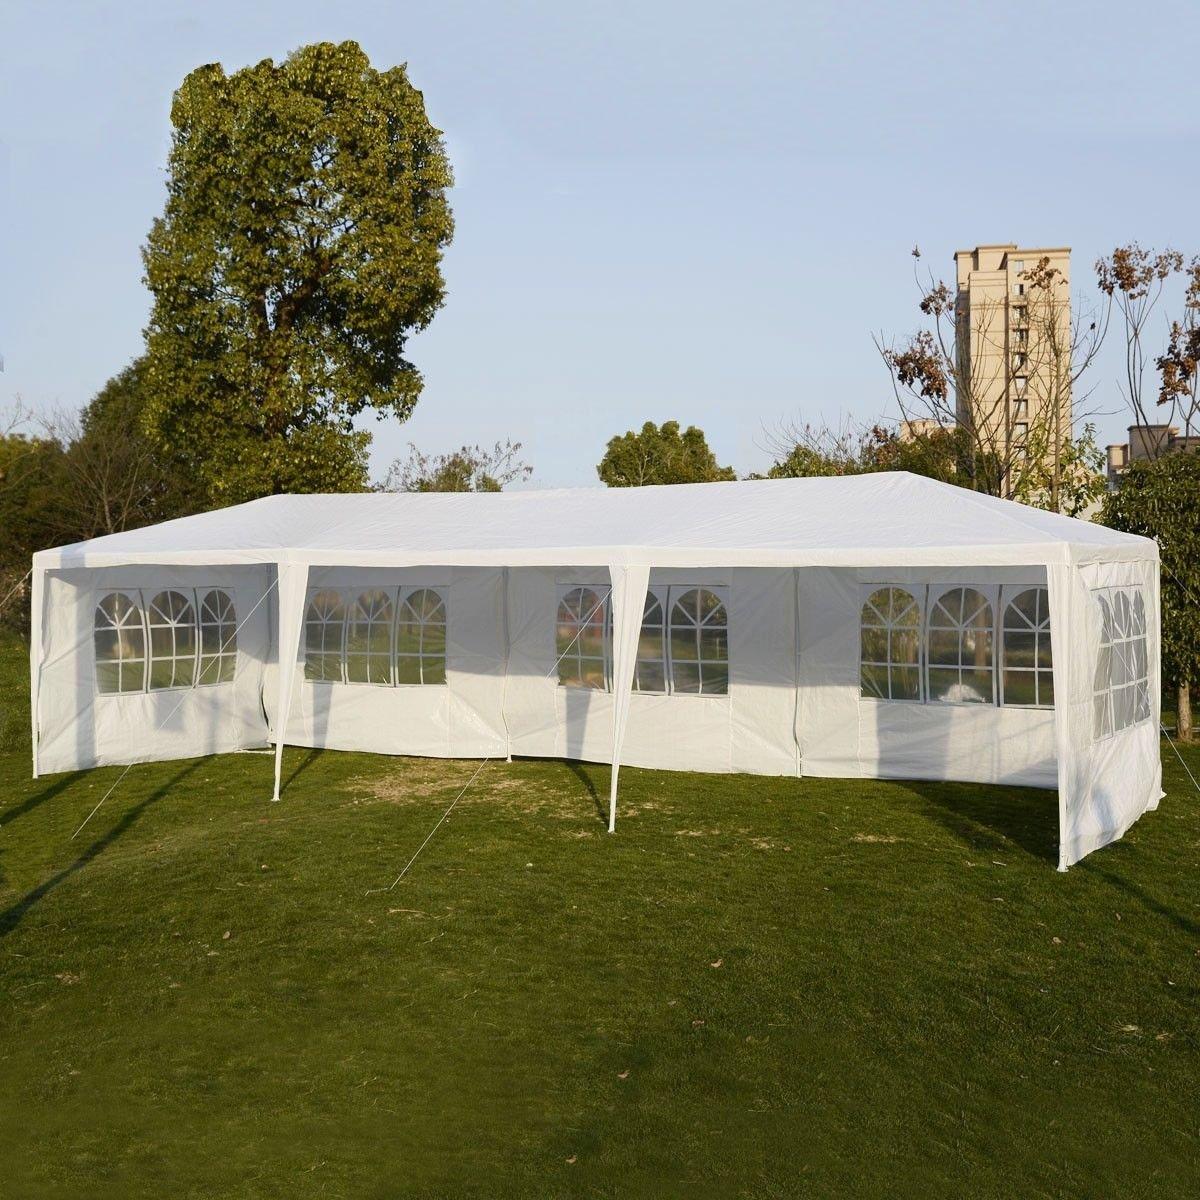 Party Outdoor Tents 10'x30' Wedding Patio Canopy Heavy Duty Gazebo Pavilion Event